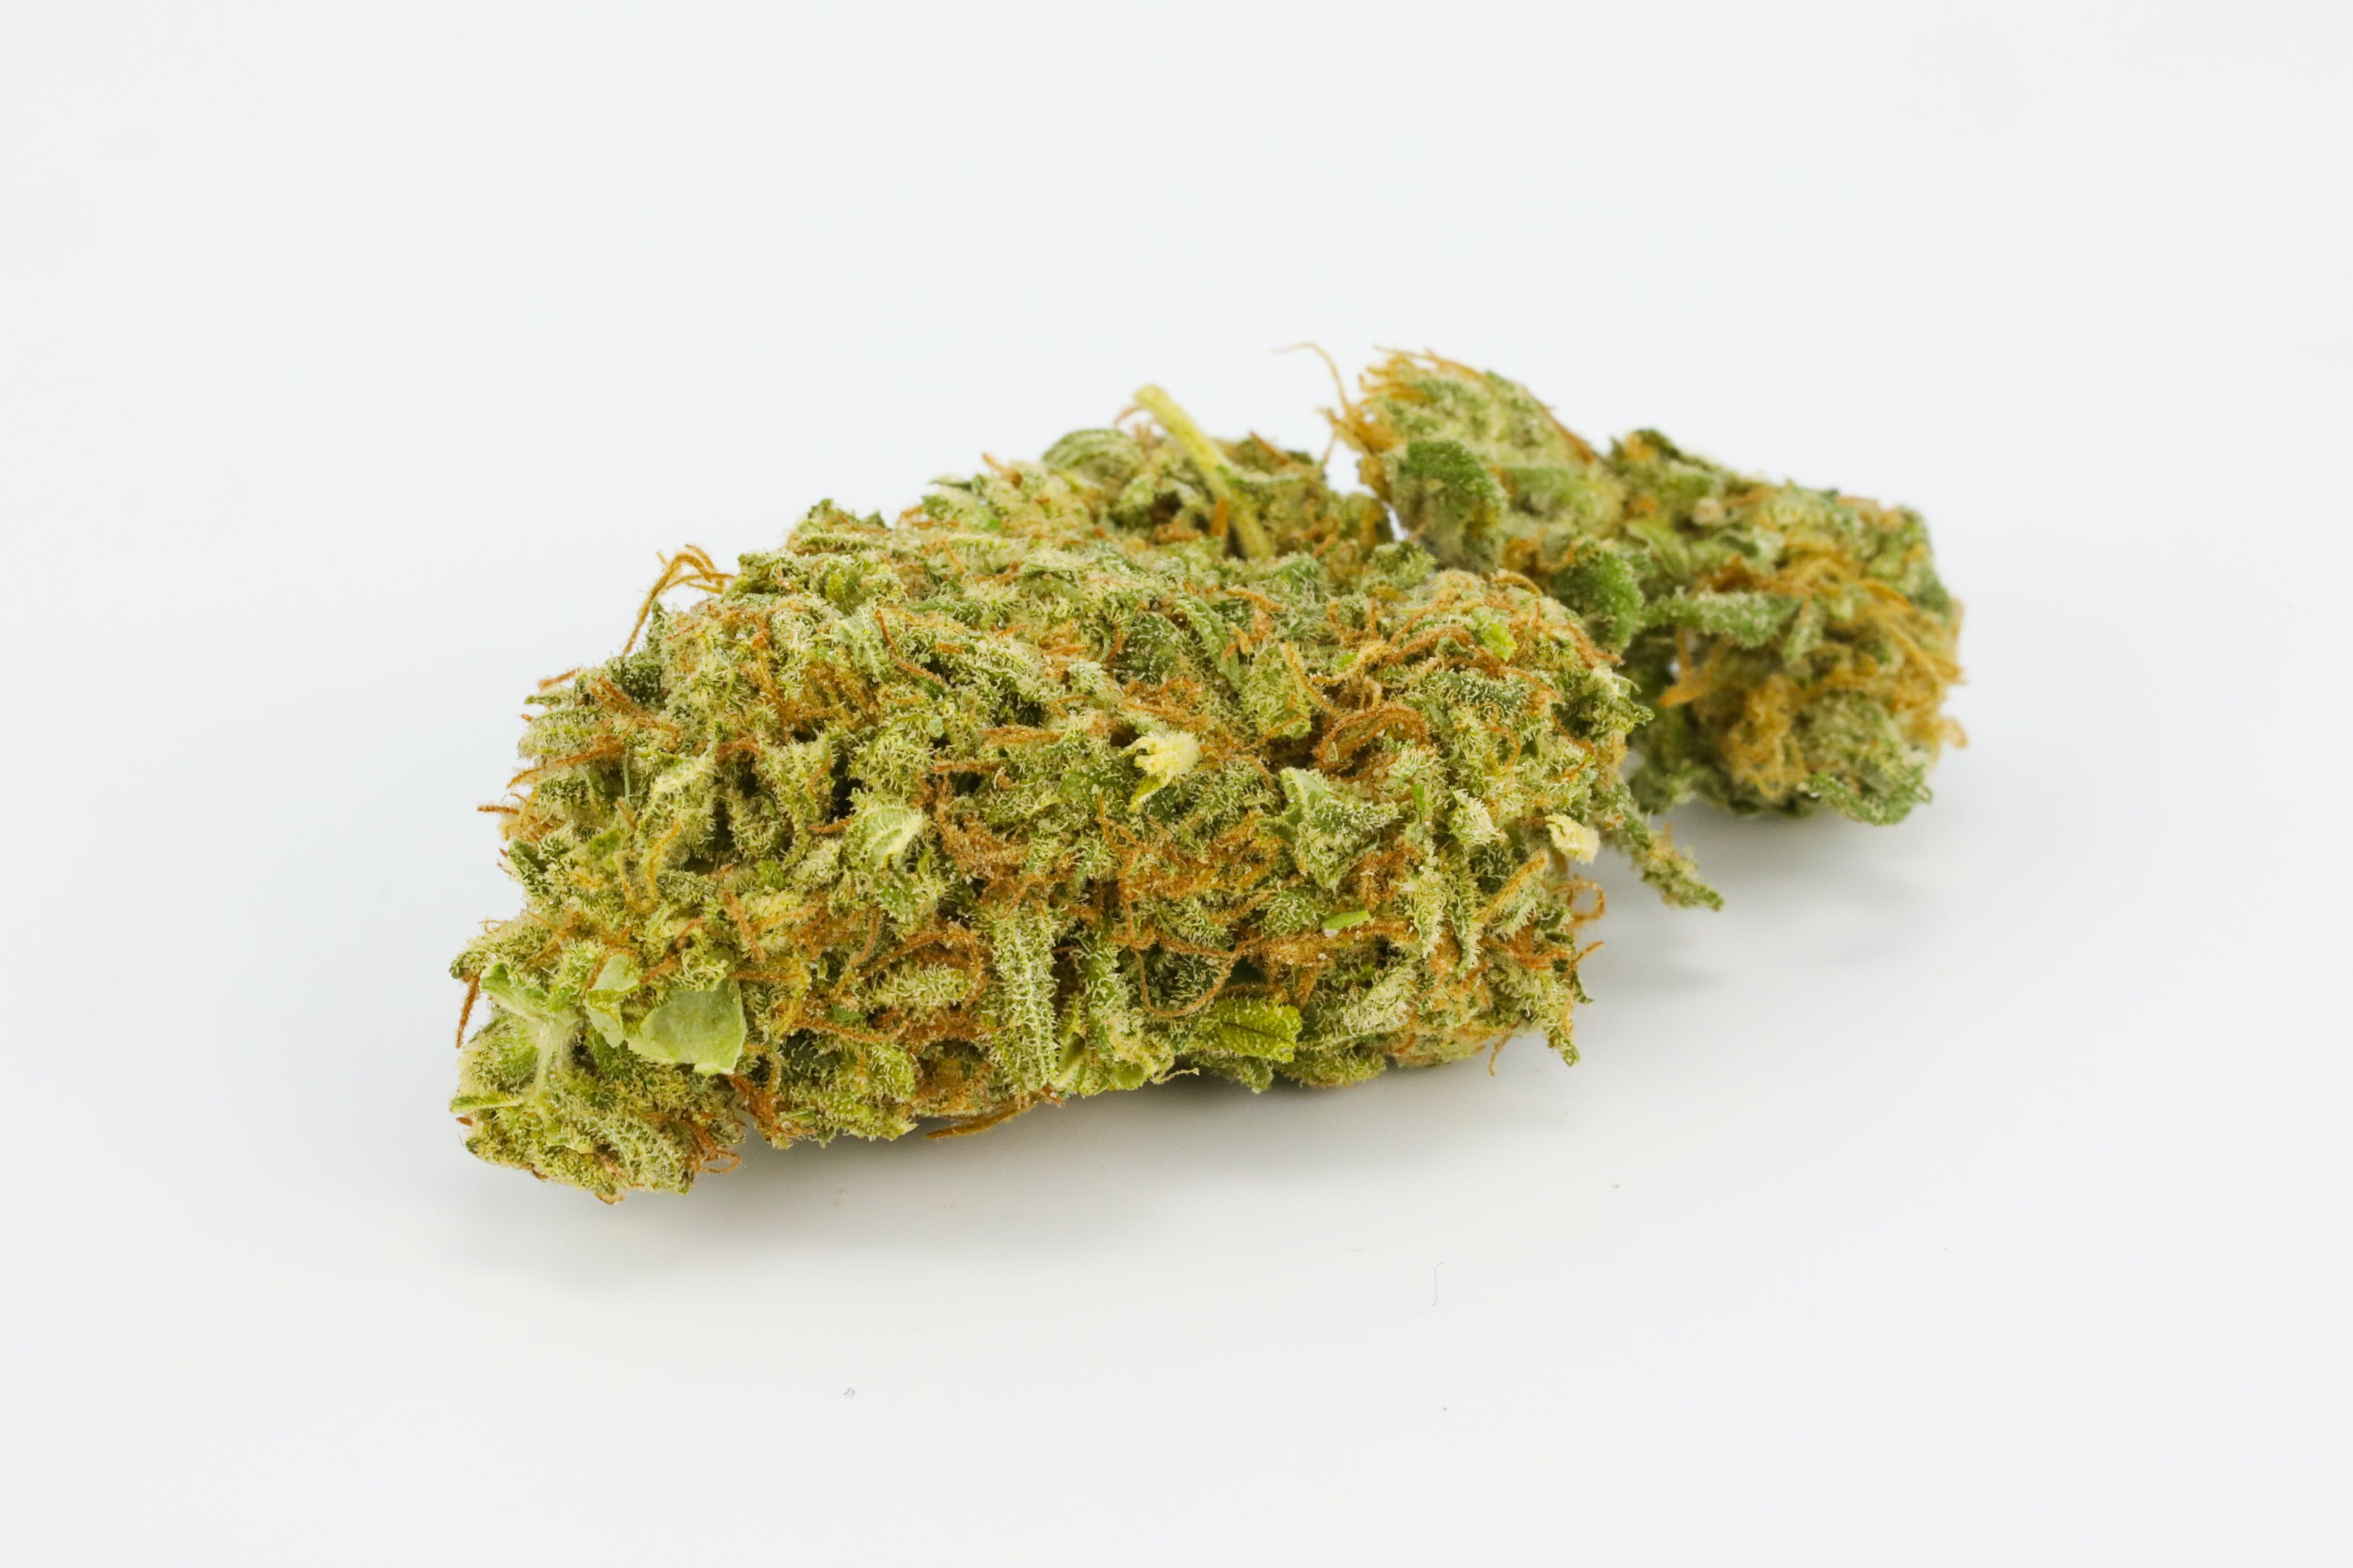 Enigma Weed; Enigma Cannabis Strain; Enigma Indica Marijuana Strain